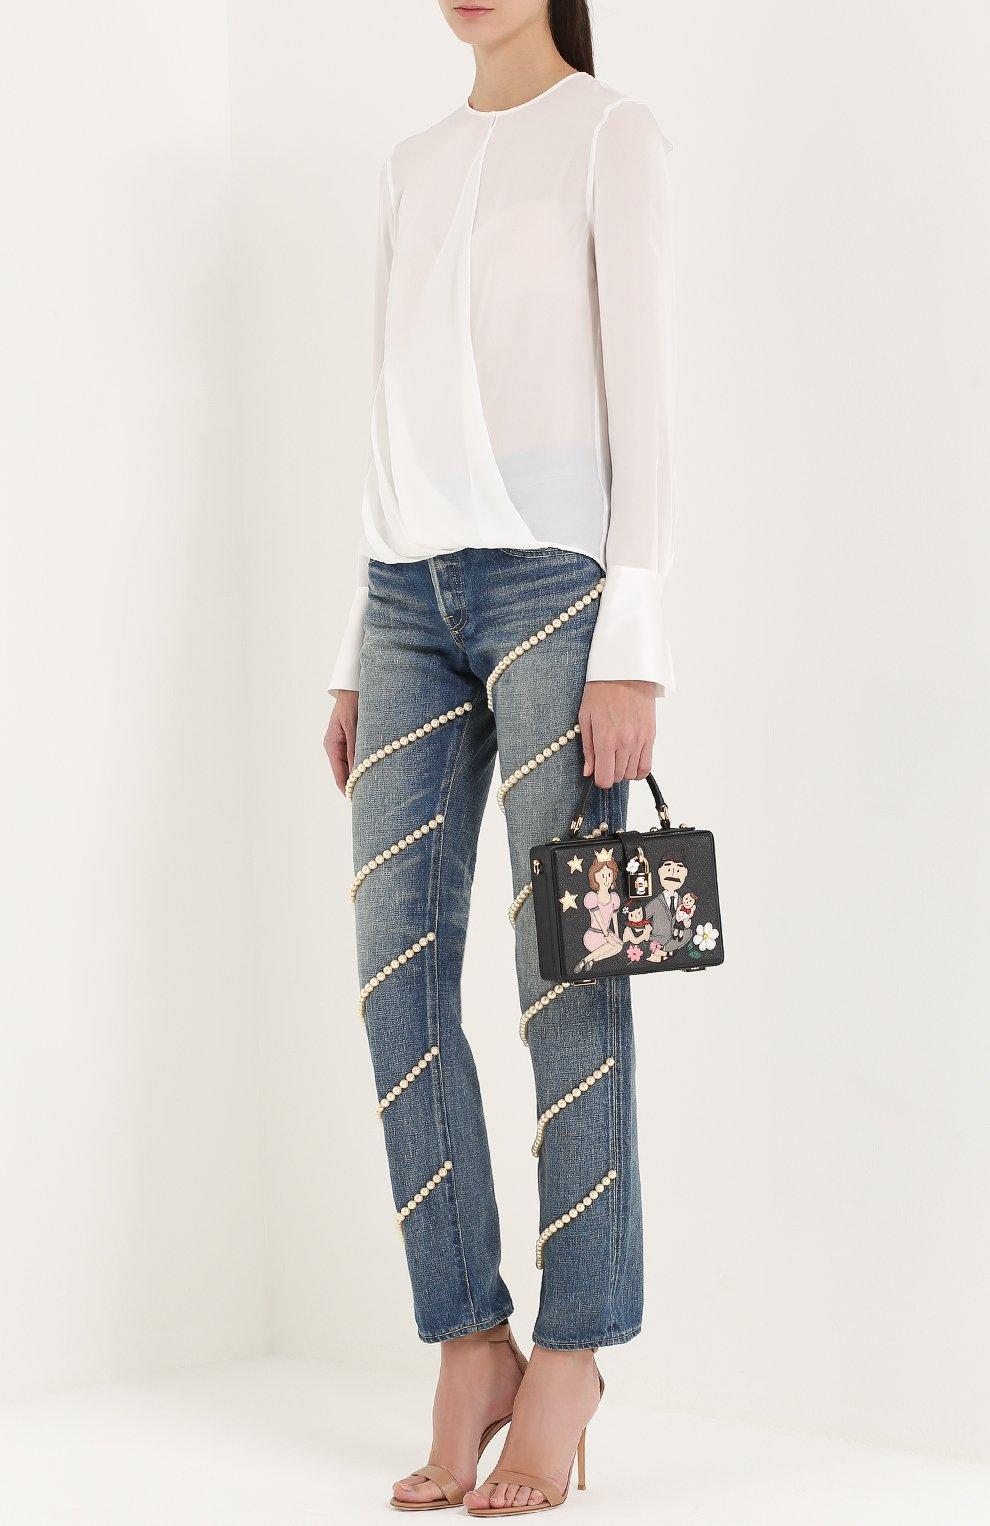 Сумка Dolce Box с аппликацией DG Family Dolce & Gabbana черная цвета | Фото №2